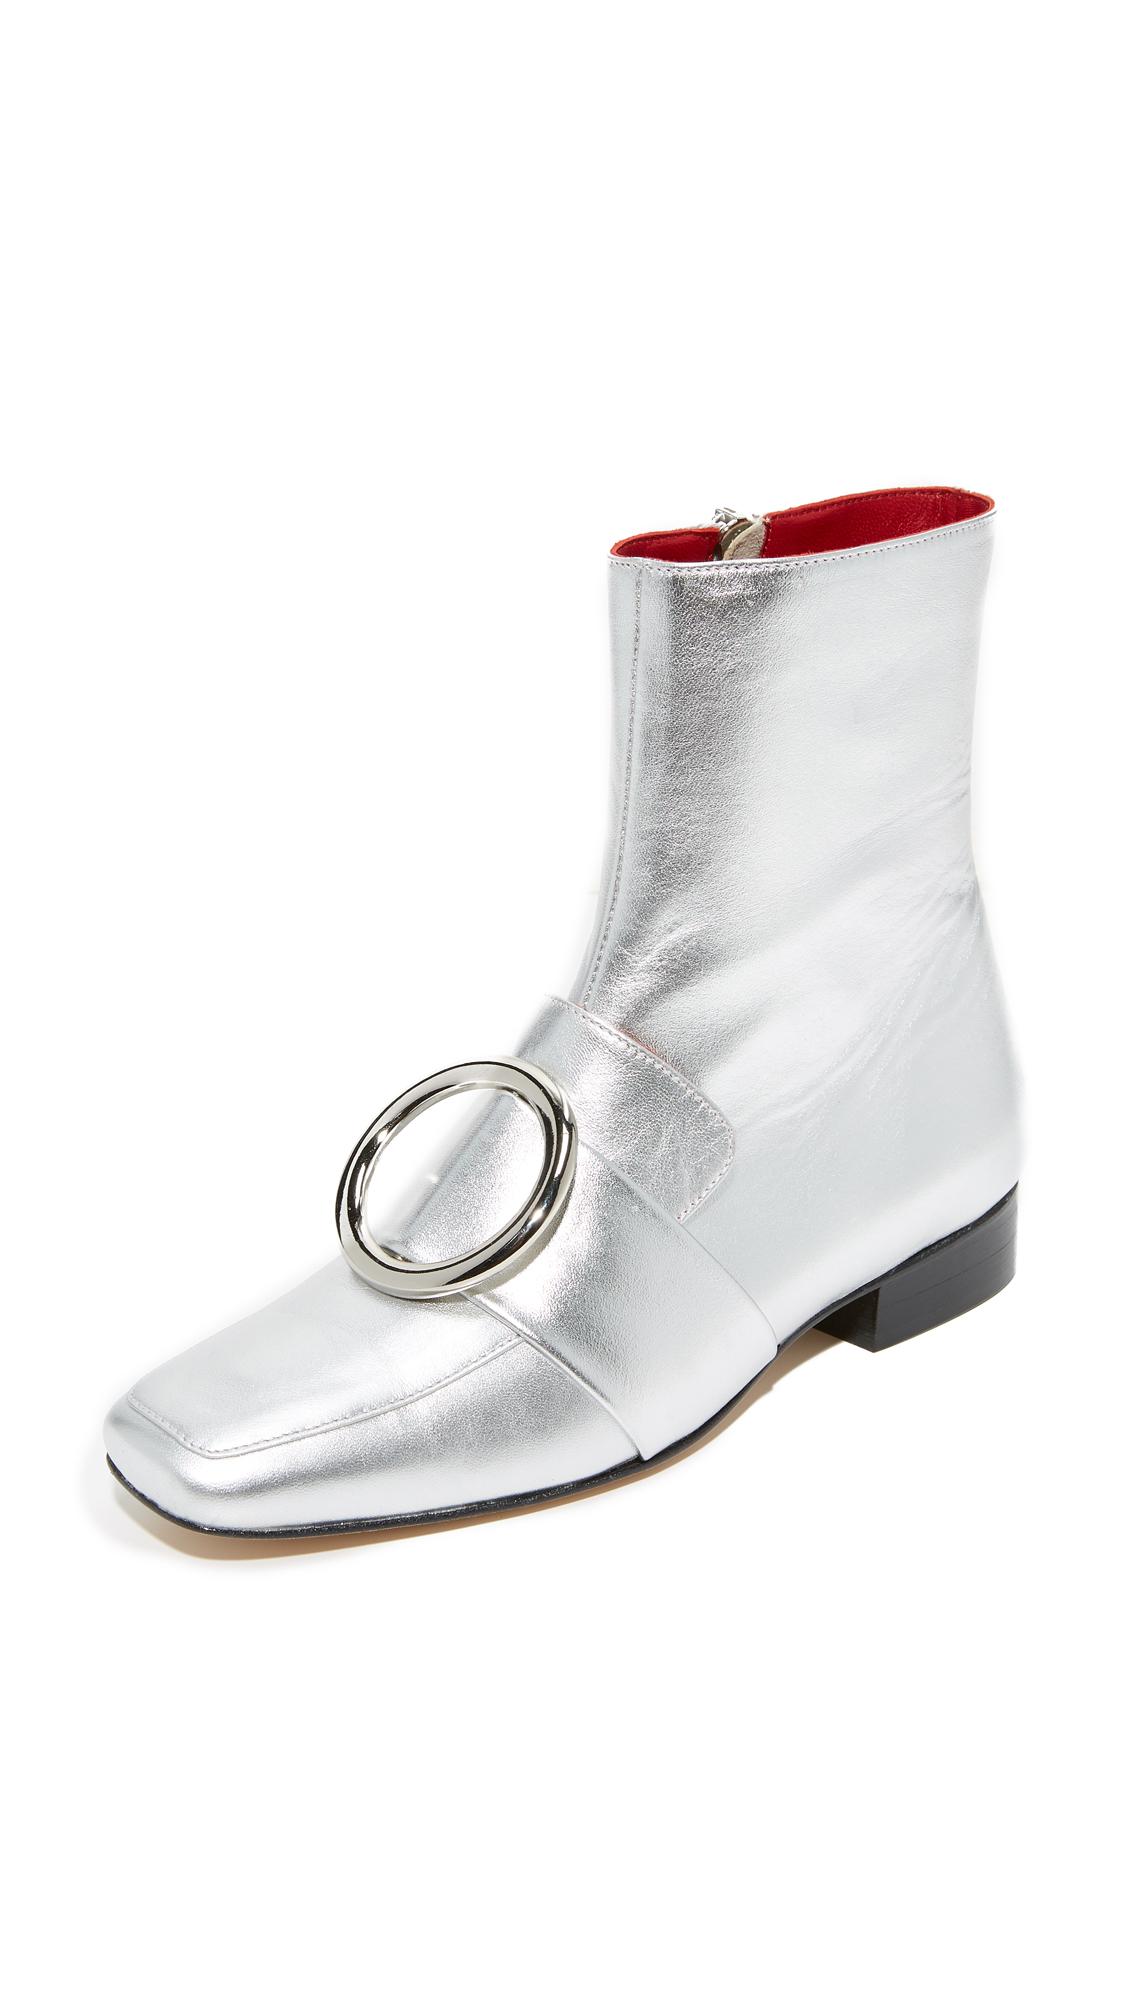 Dorateymur Biturbo Buckle Booties - Silver